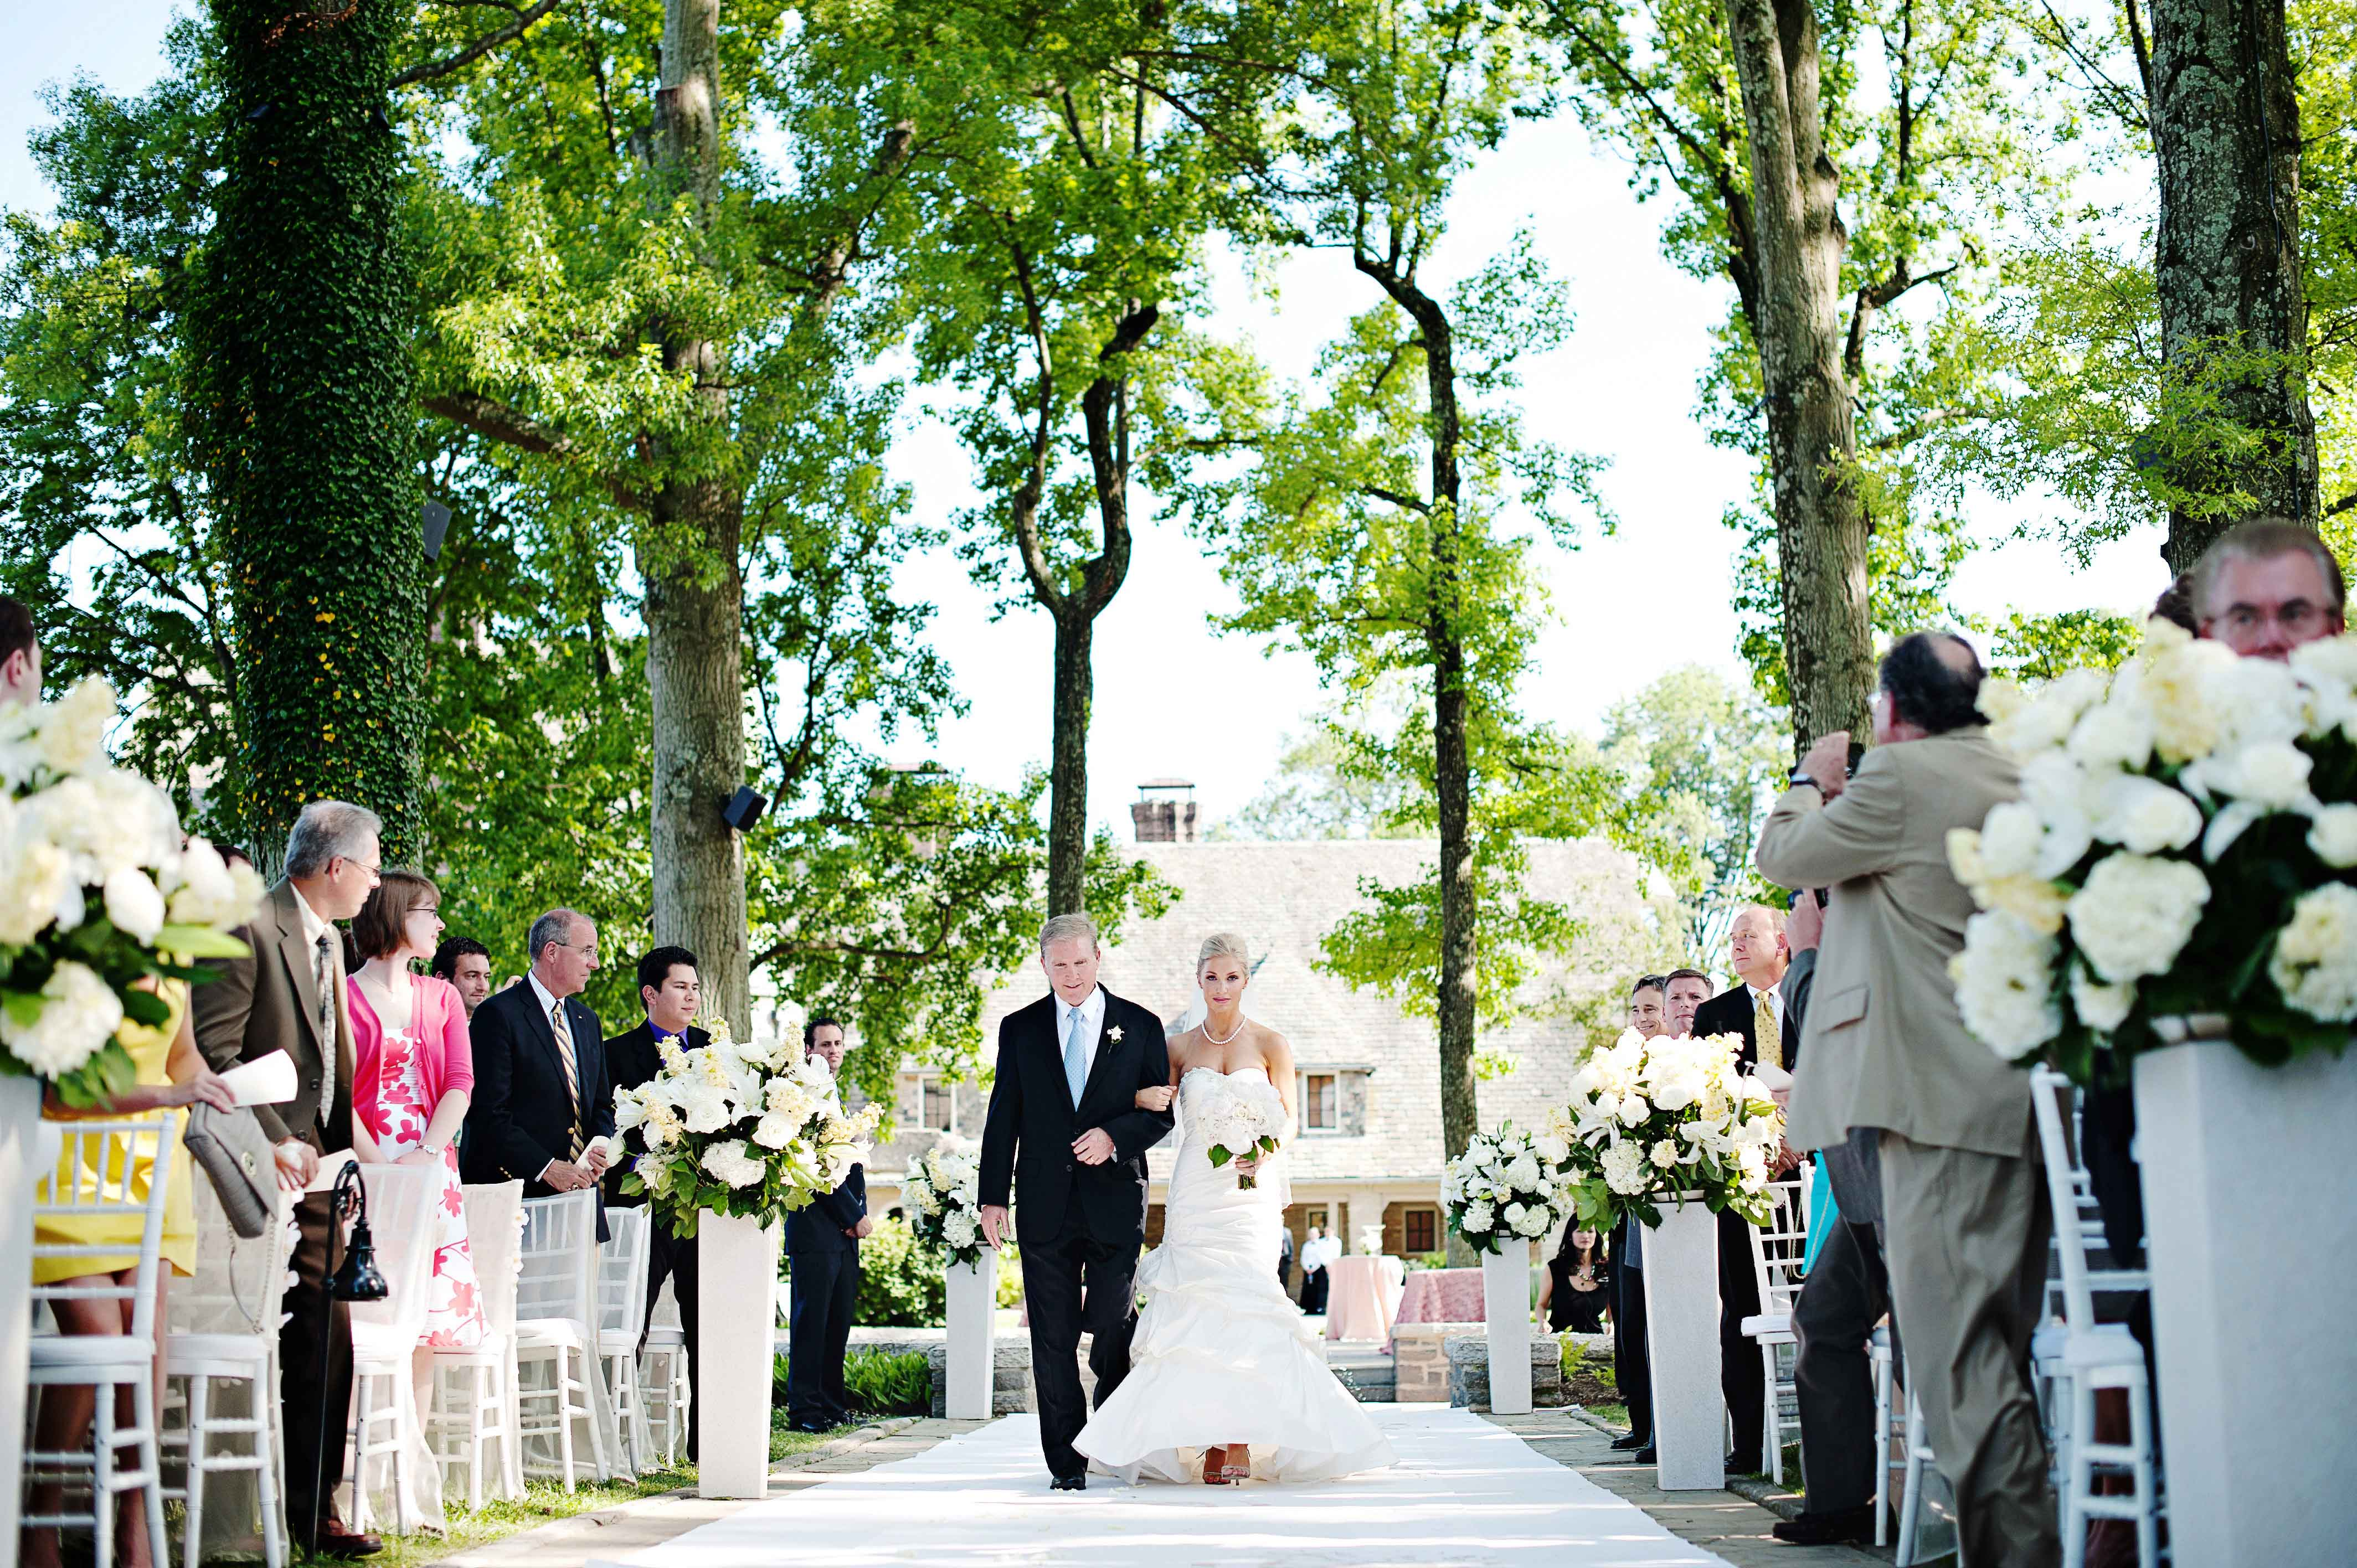 Wedding processional under large tree